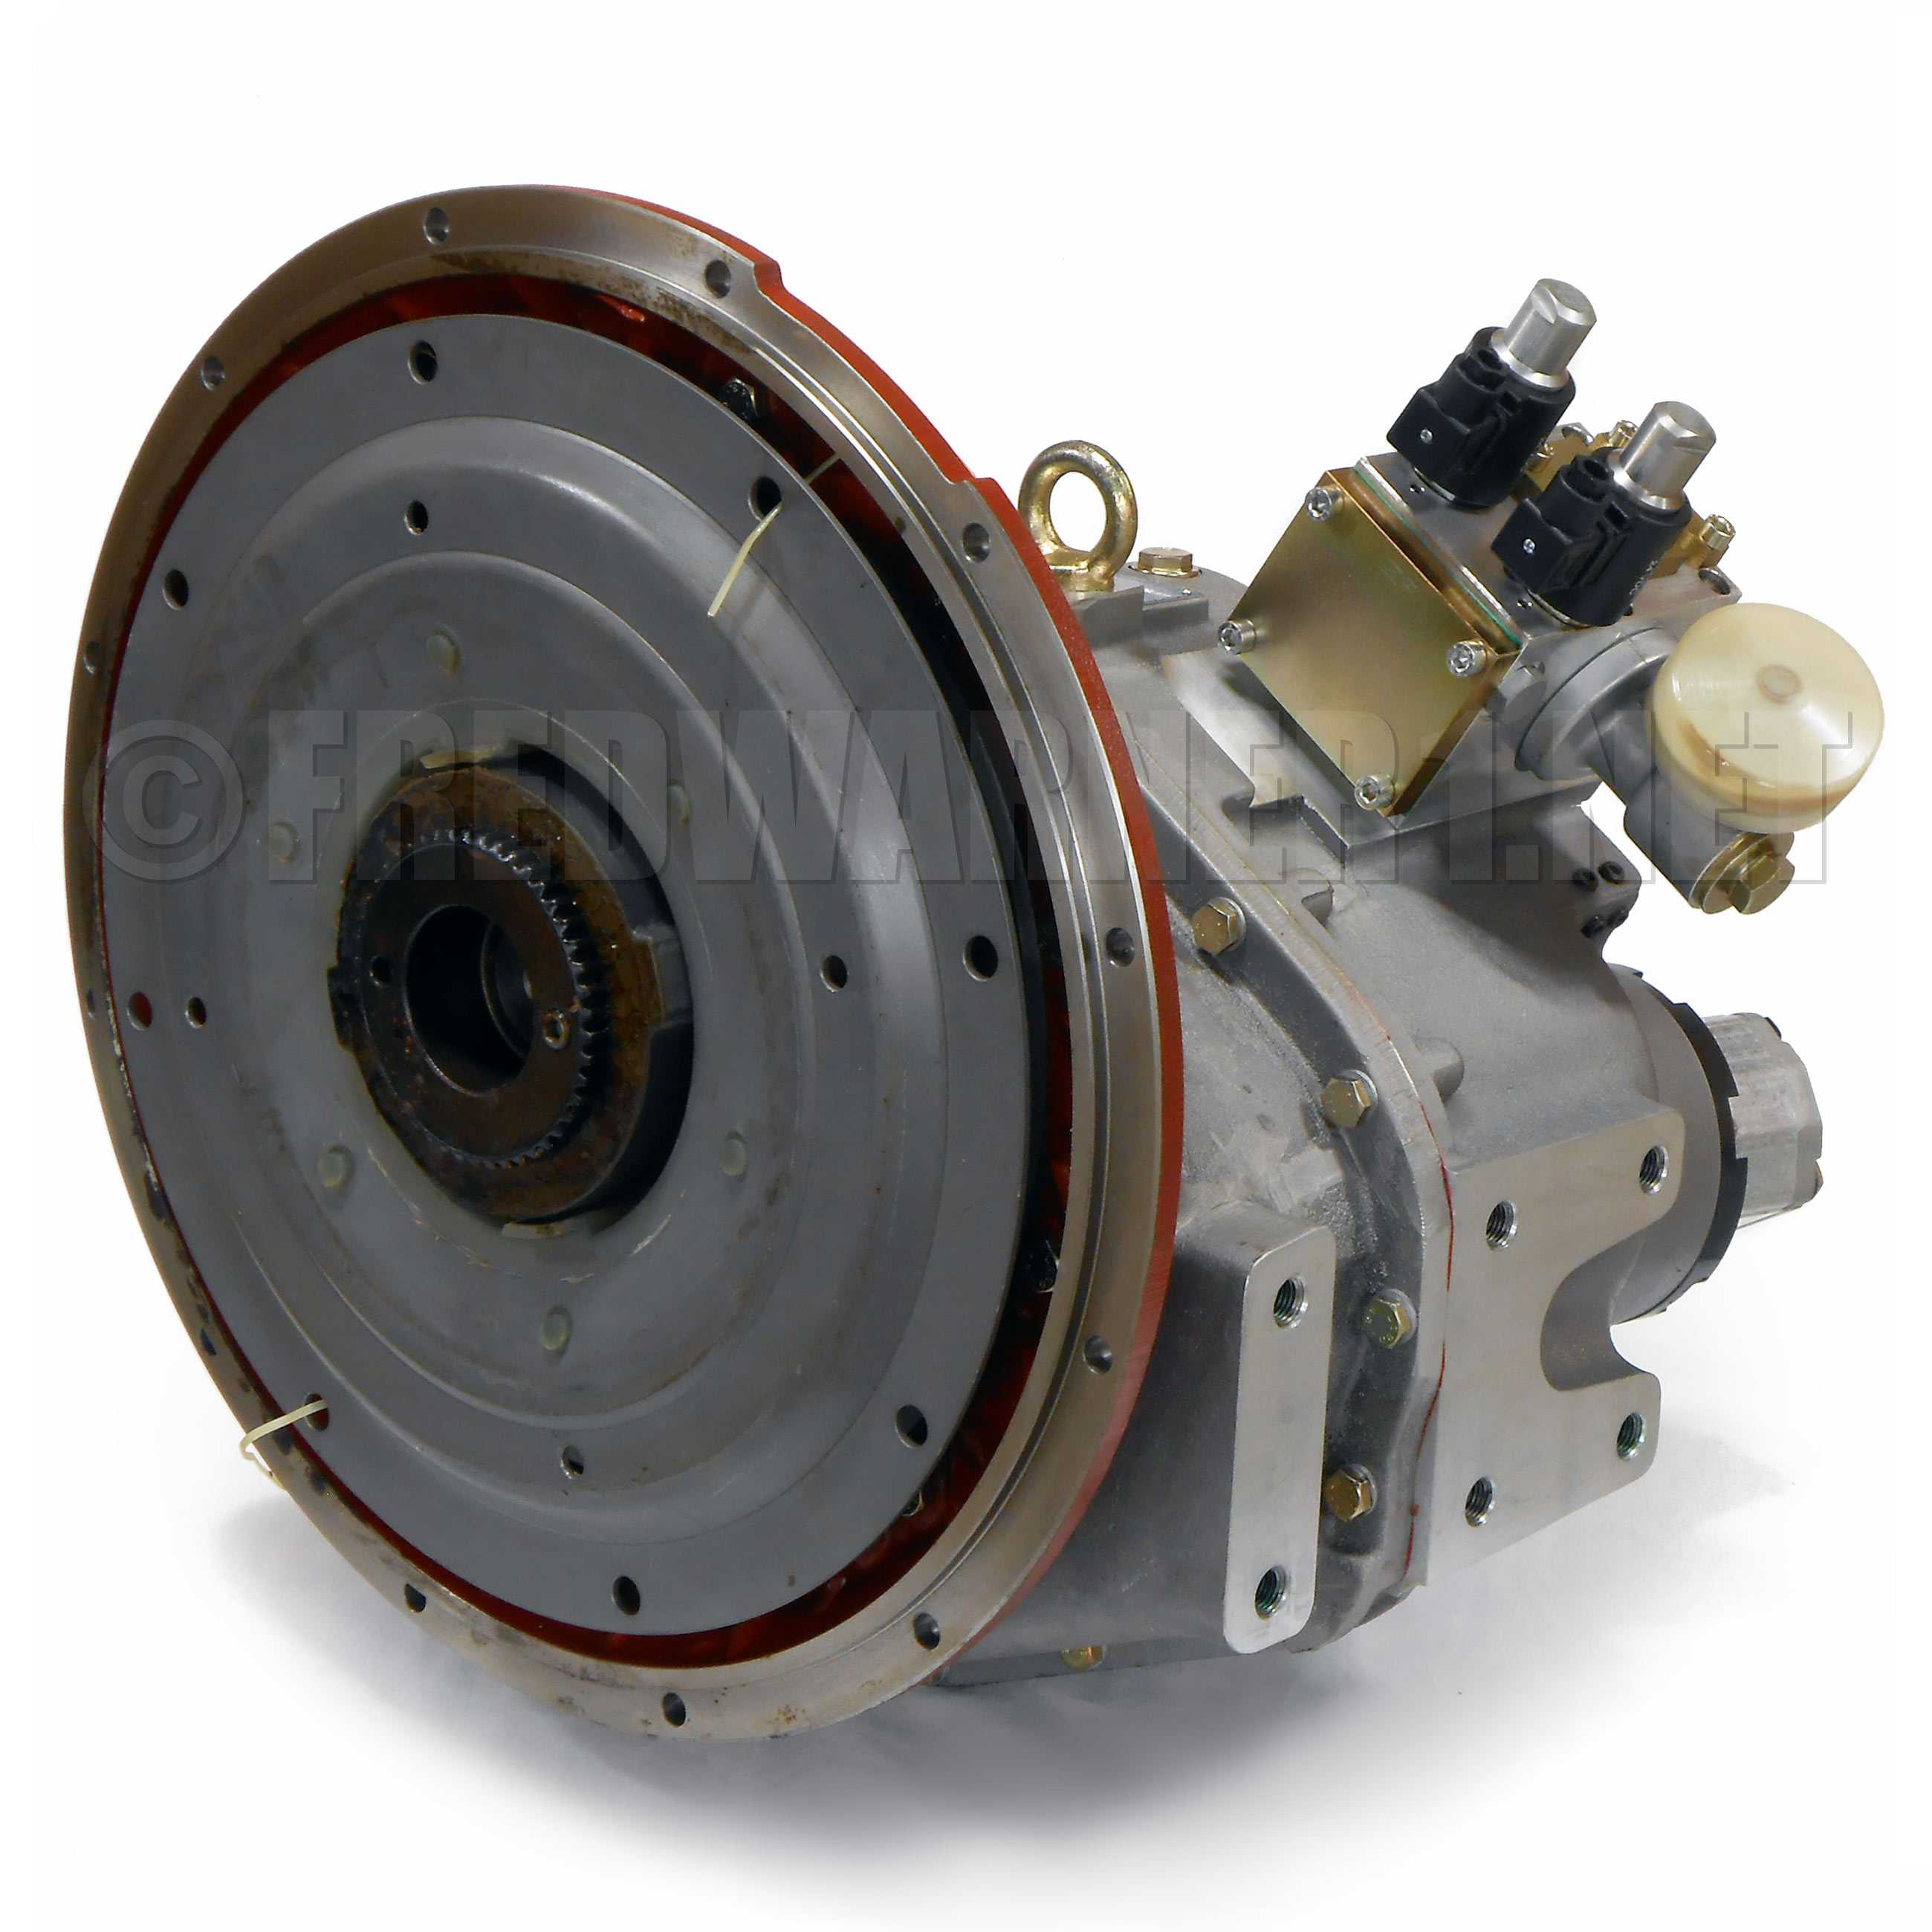 zf 325 1a 1 733 1 marine boat transmission 24v down angle 3214001038 rh fredwarner1 net ZF Automatic Transmission Ford ZF Manual Transmission